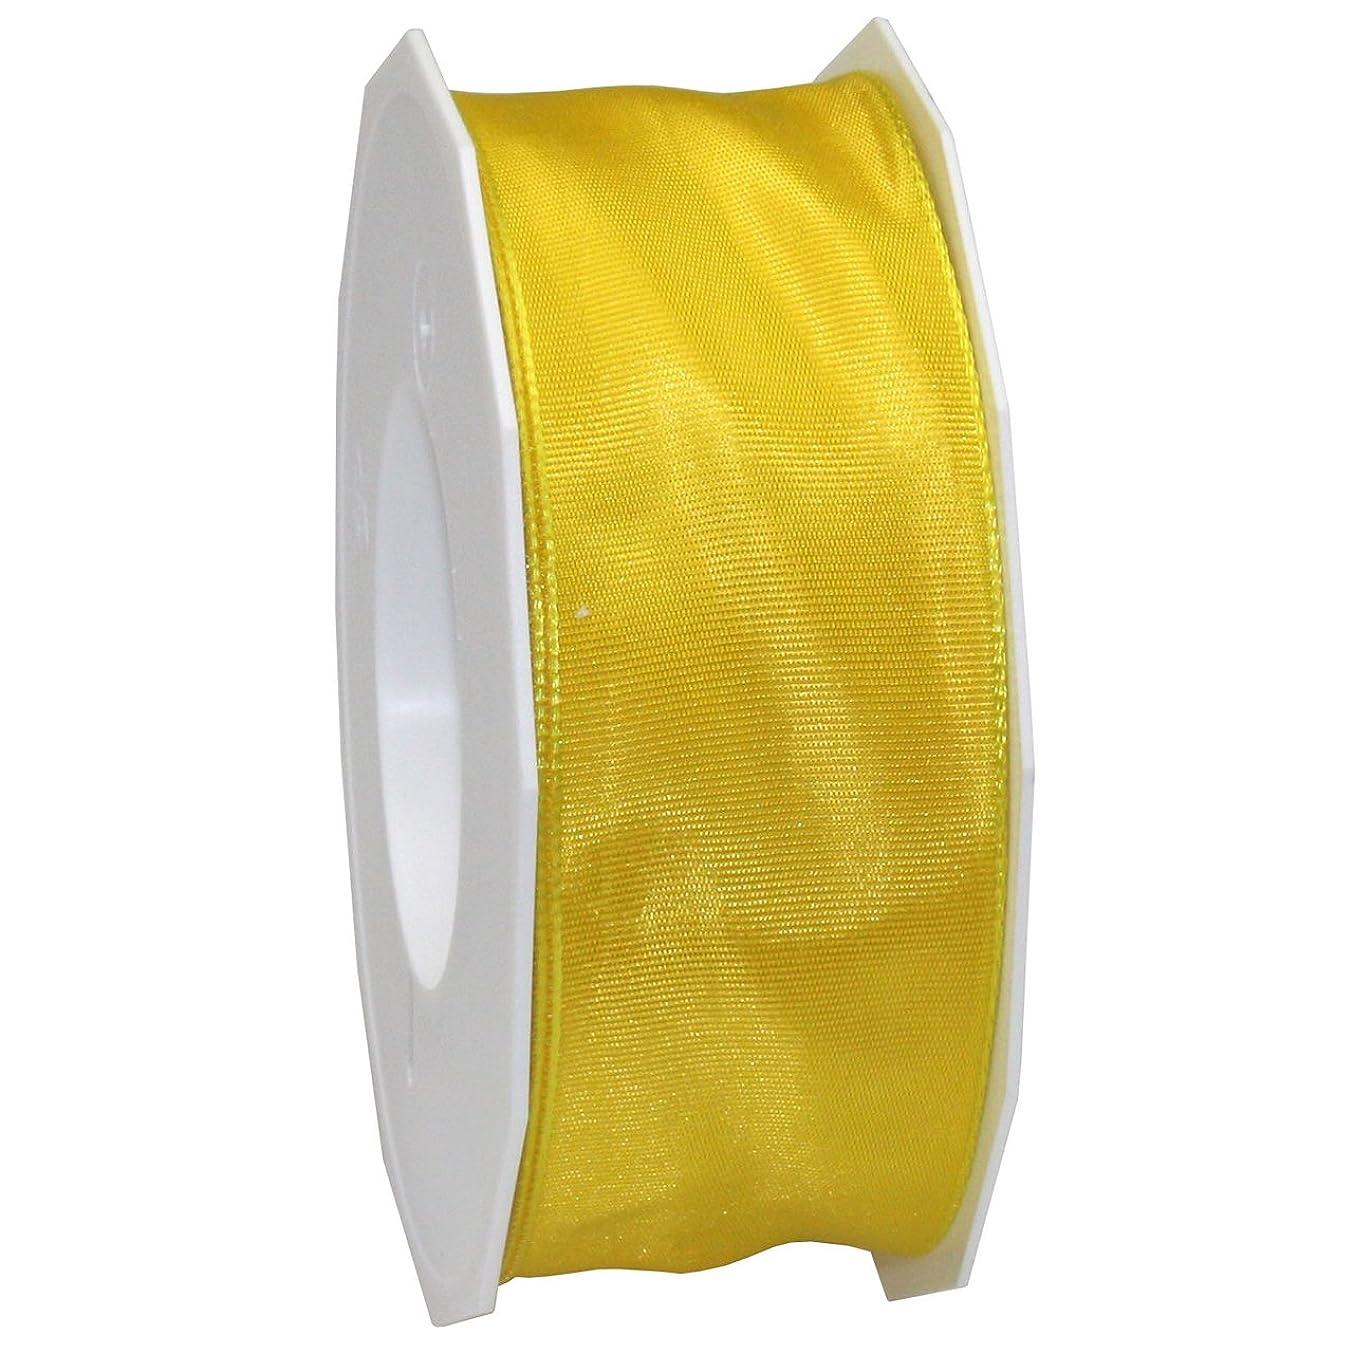 Morex Ribbon French Wired Lyon Fabric Ribbon, 1-1/2-Inch by 27-Yard, Yellow